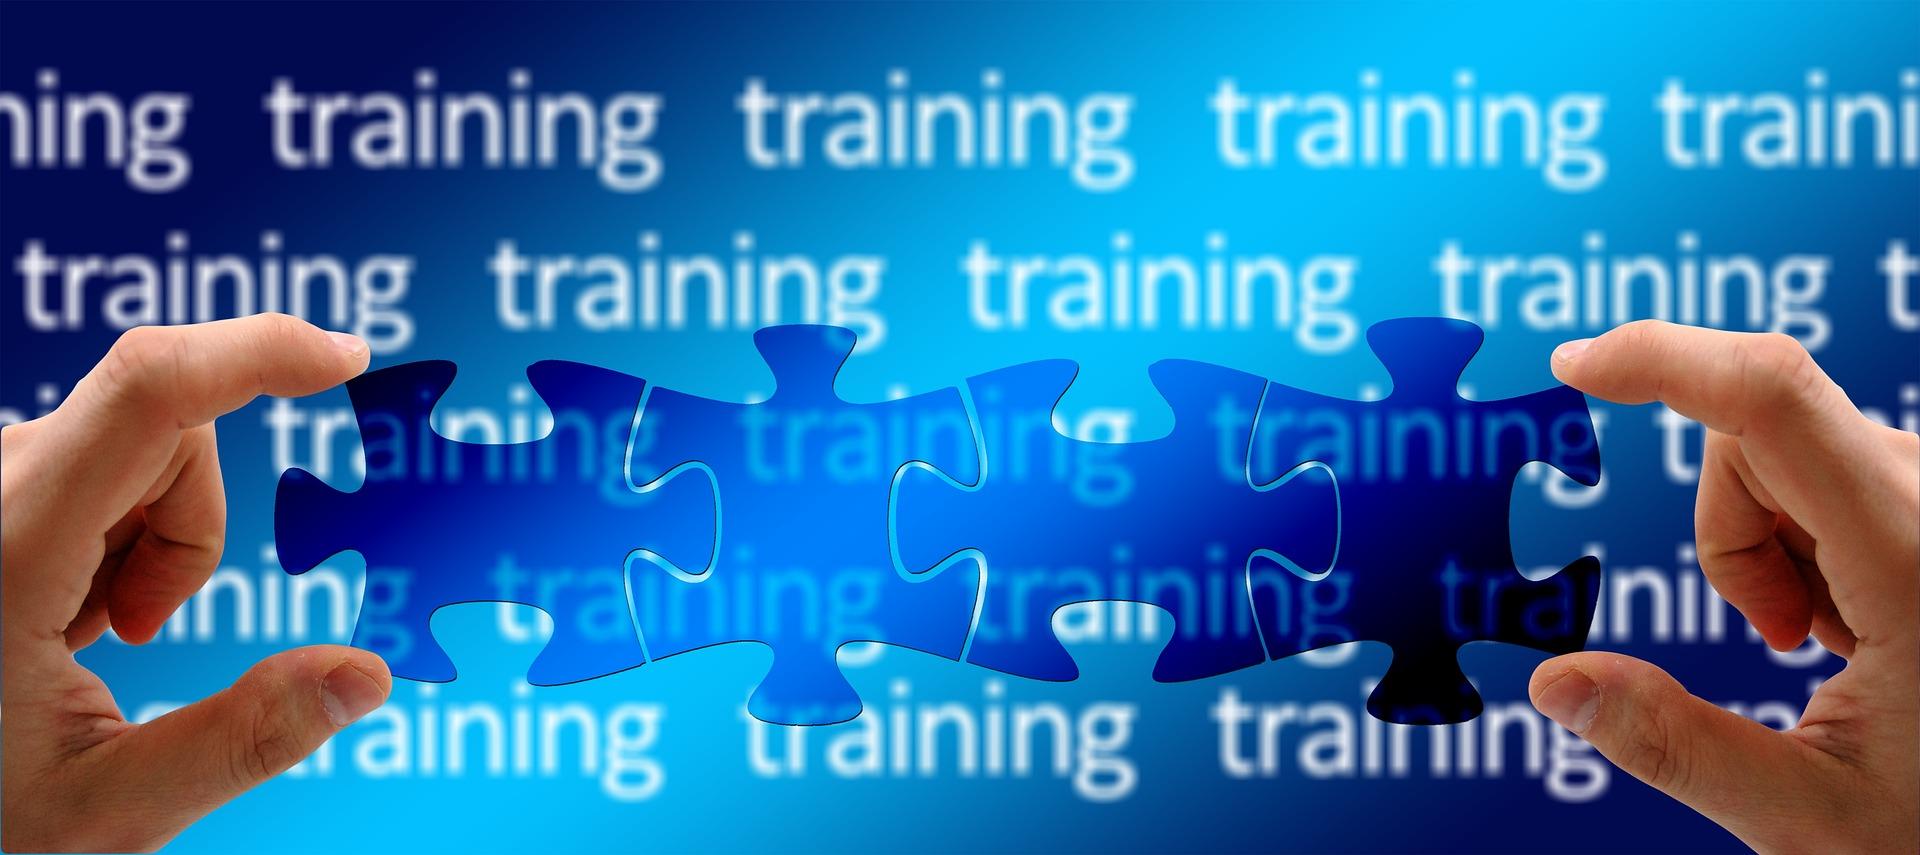 training-1848689-1920.jpg